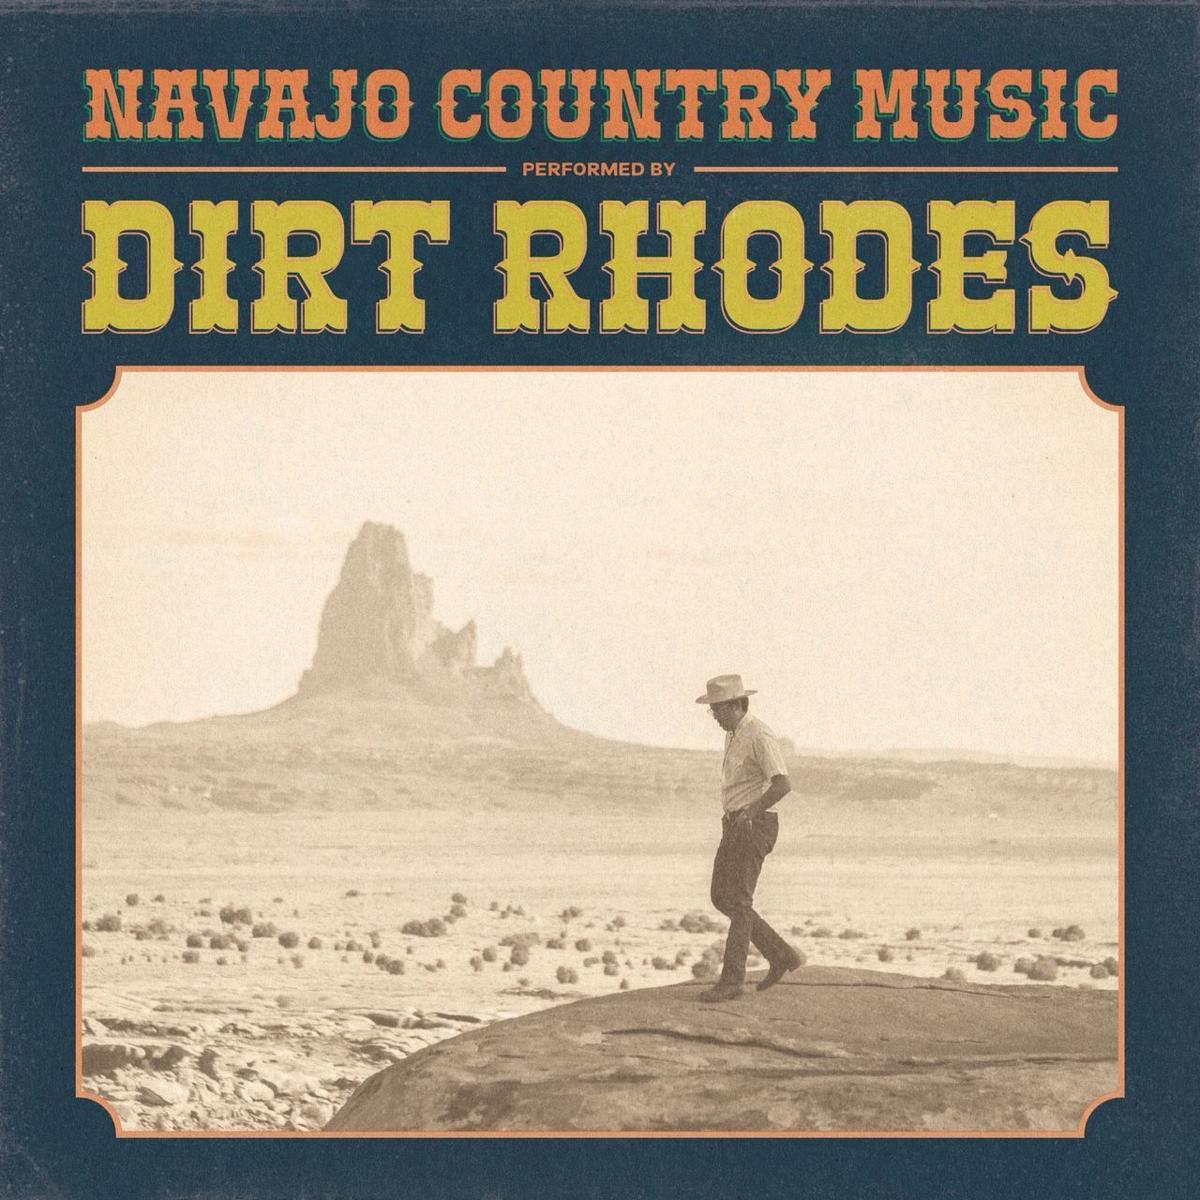 COVER_Navajo Country Music album cover, album art by Ryan Allison aka Dirt Rhodes.JPG